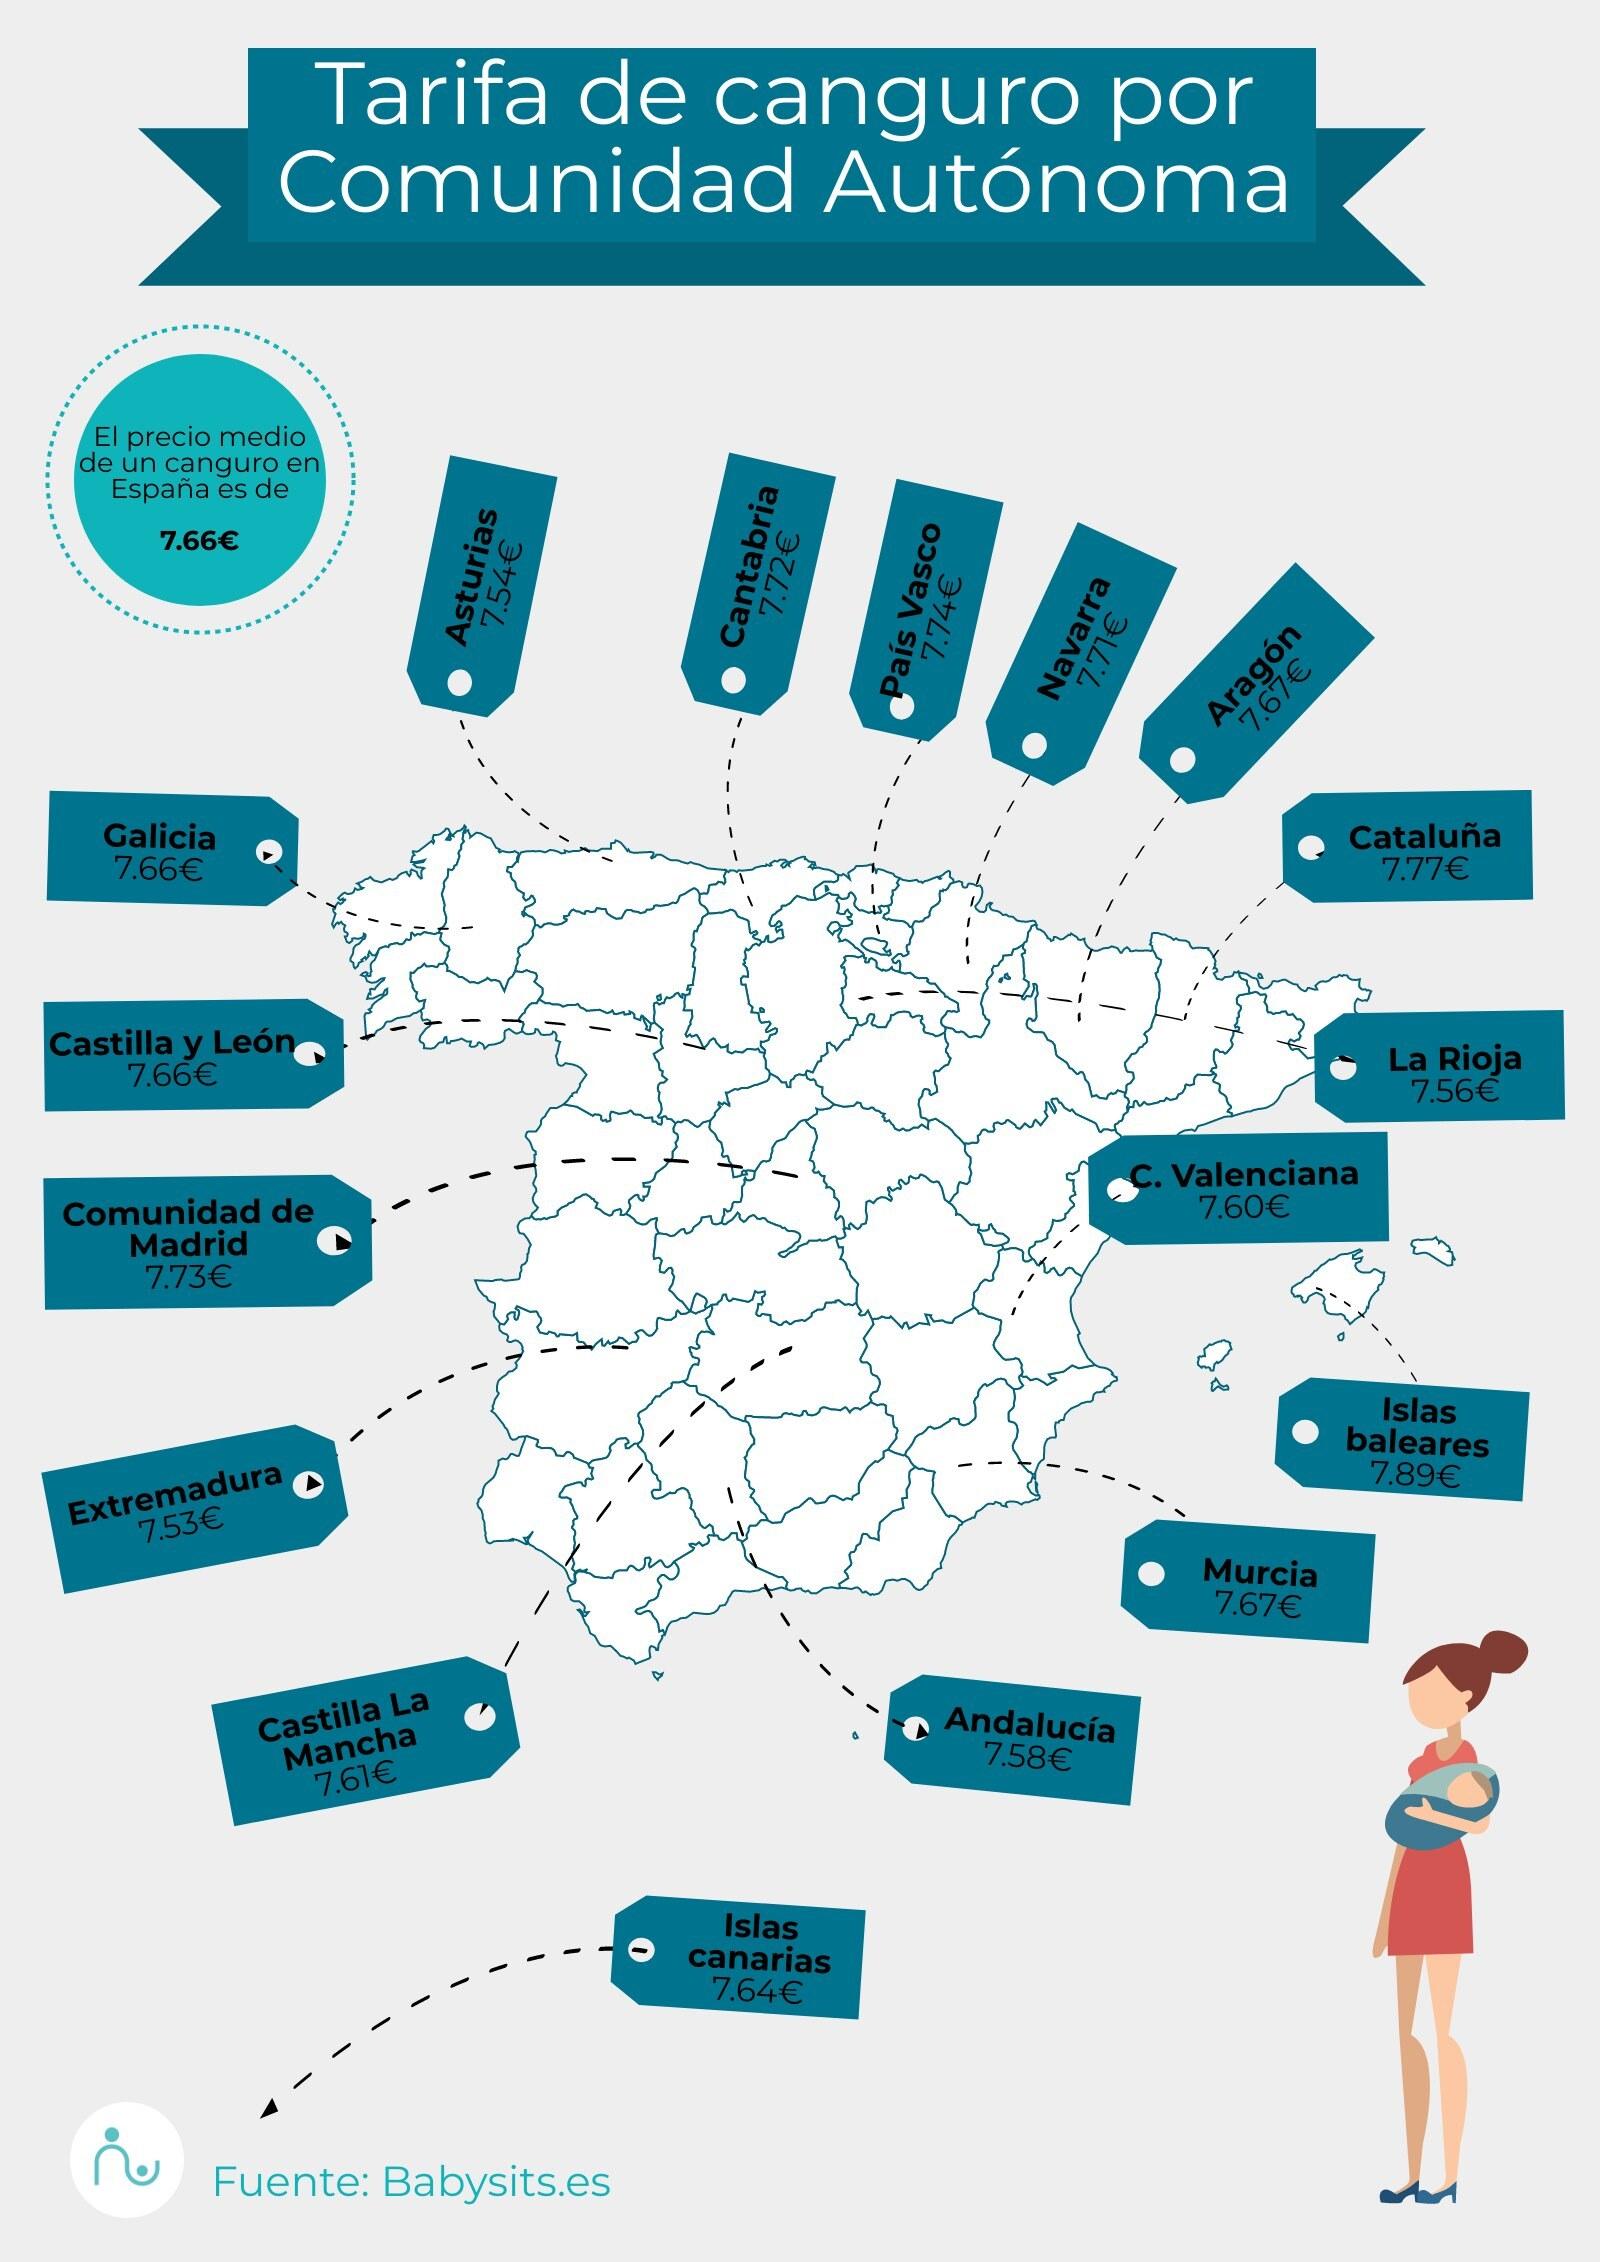 Tarifas de canguro por Comunidad Autónoma en España 2020